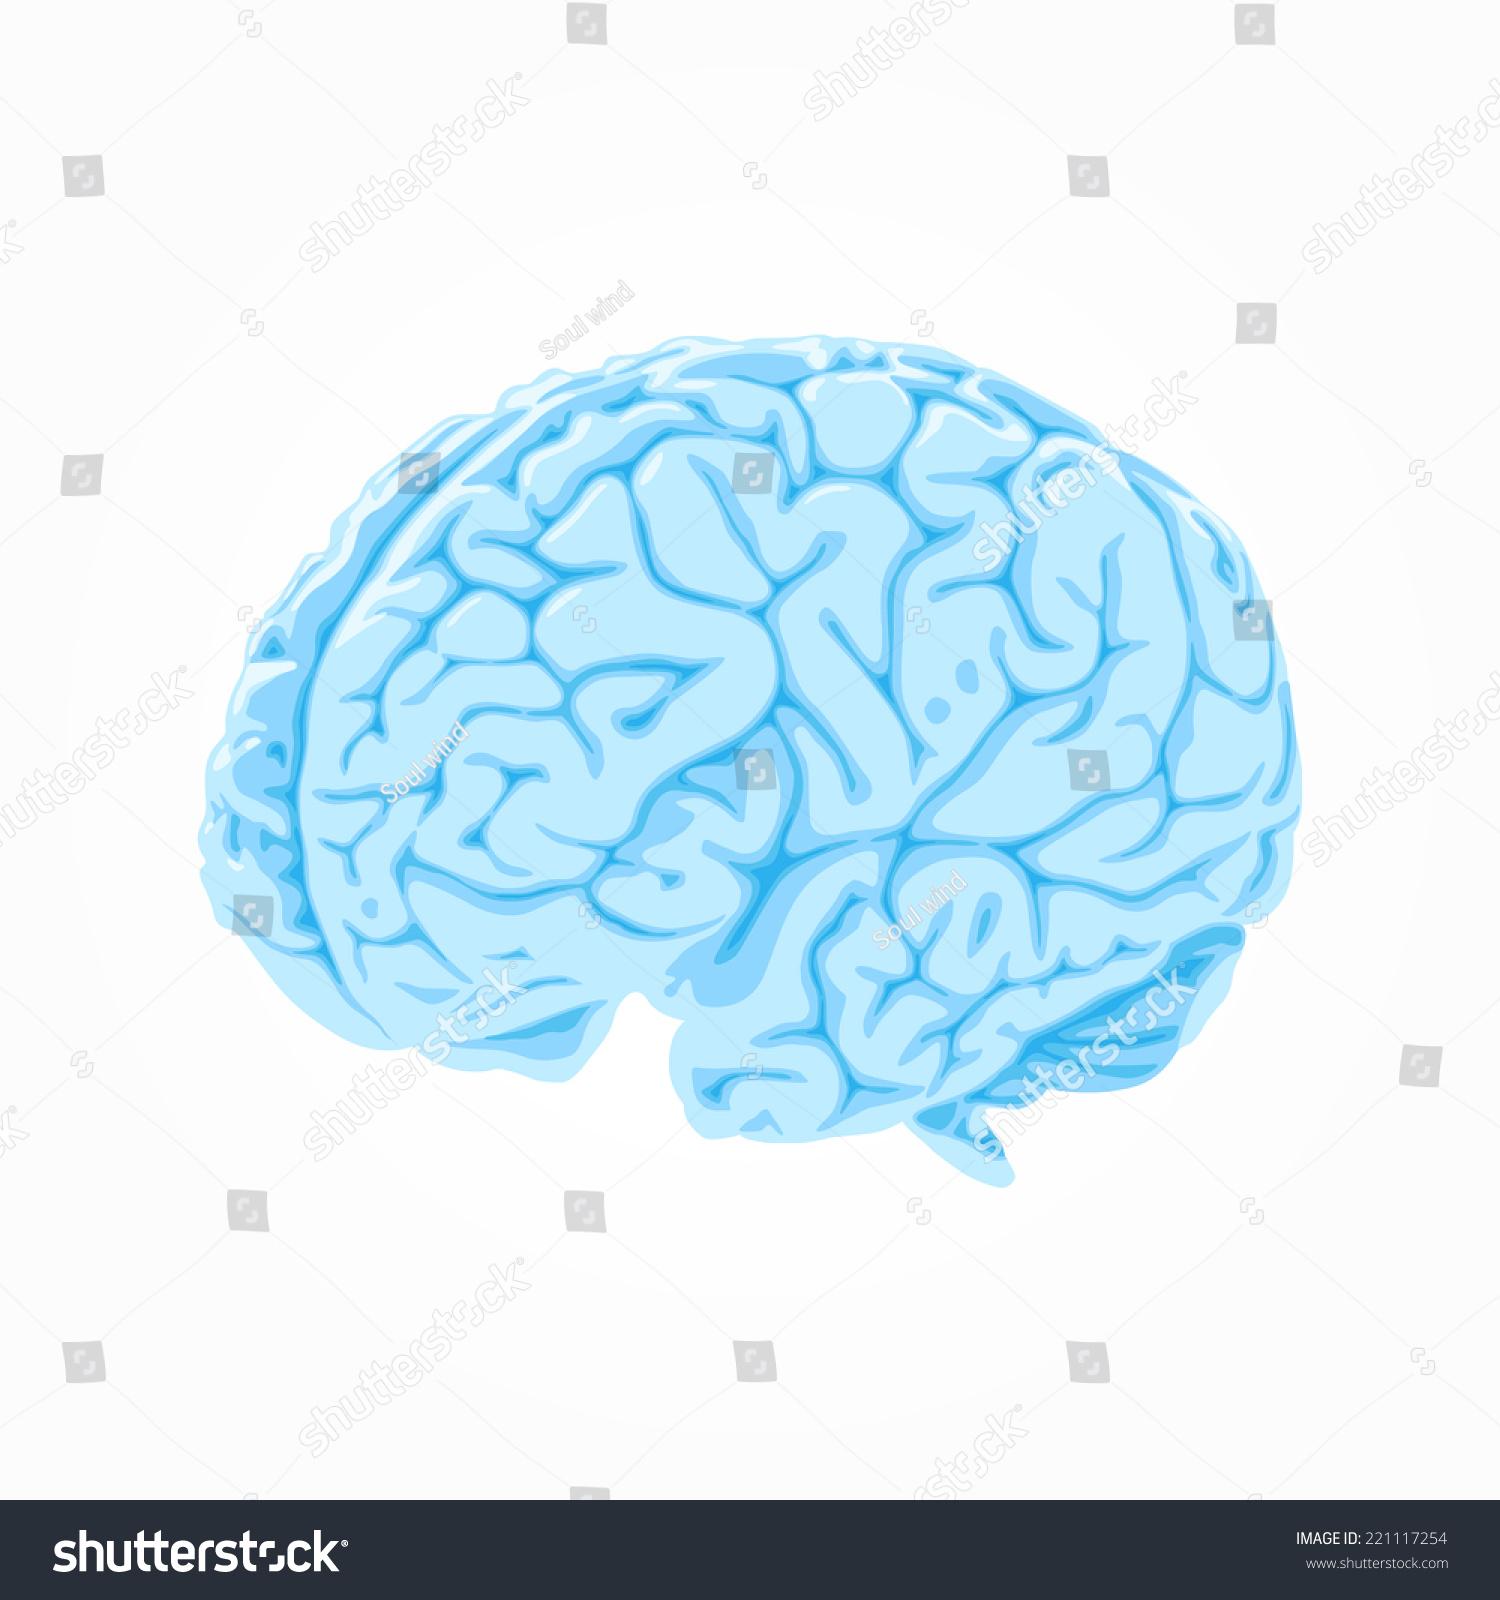 Blue Brain Icon Stock Vector 221117254 - Shutterstock